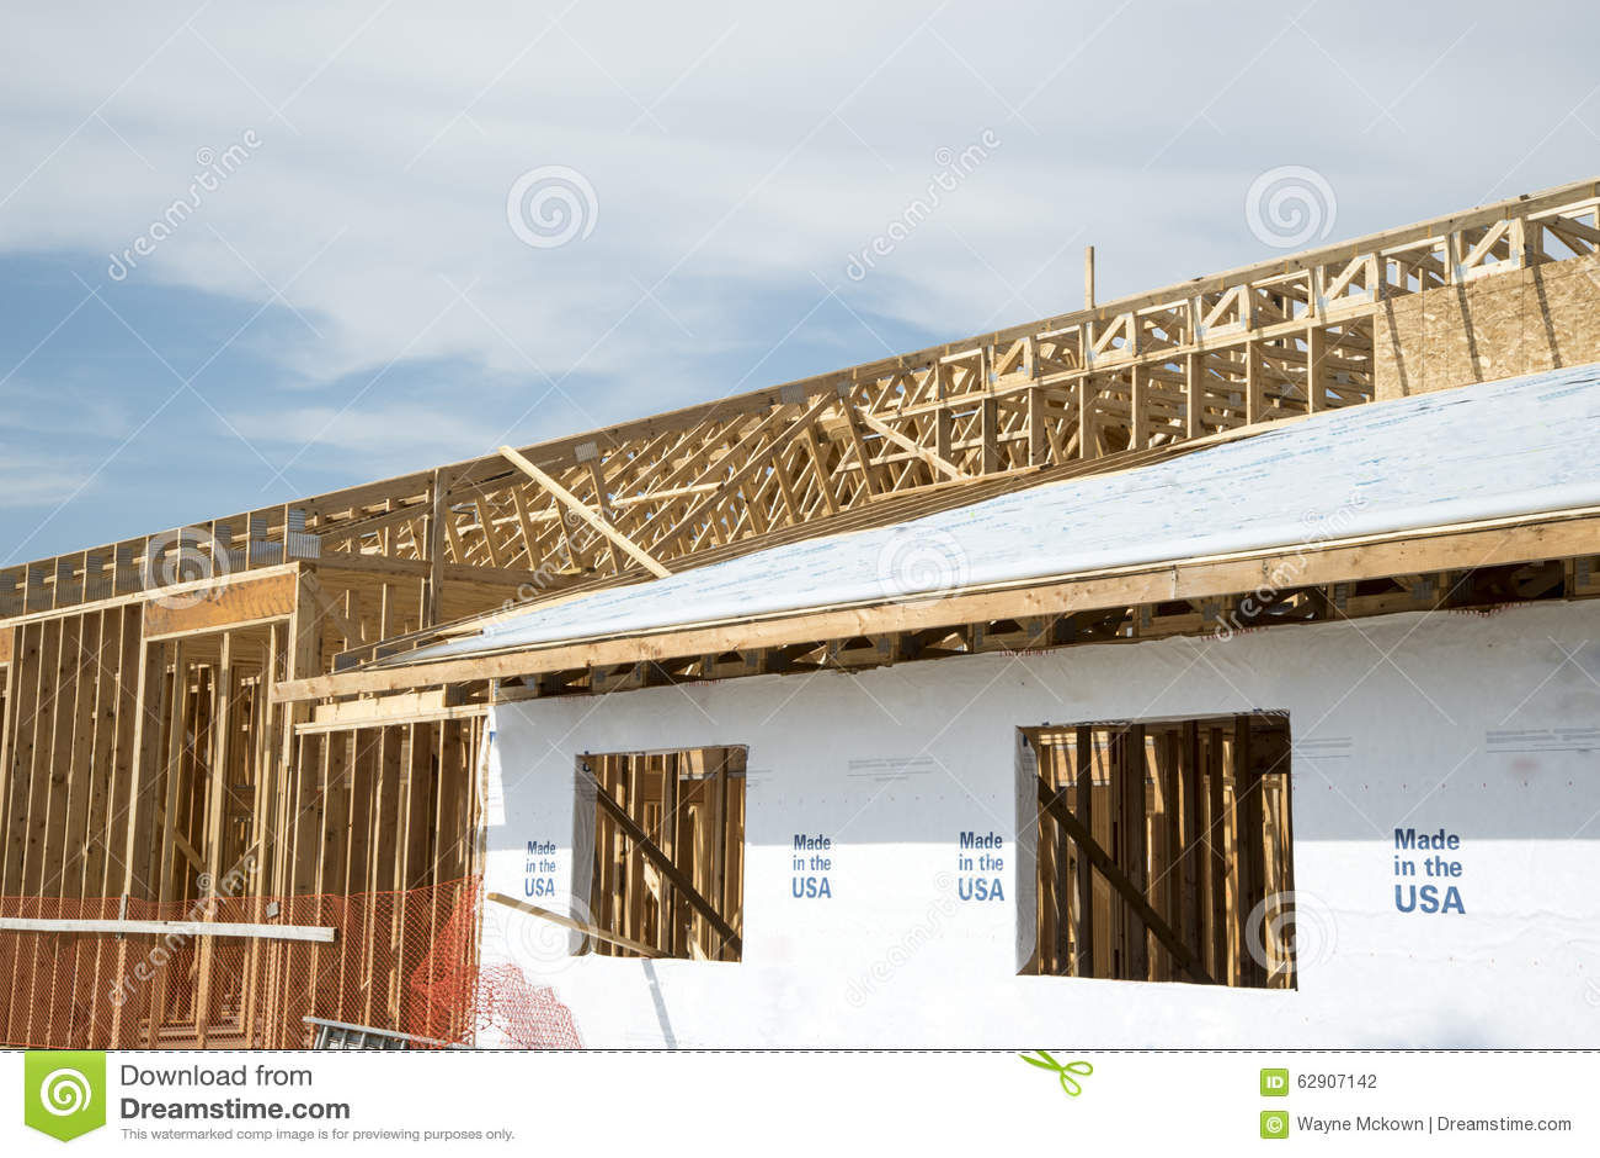 Building Wood Framing Stock Photo Image 62907142